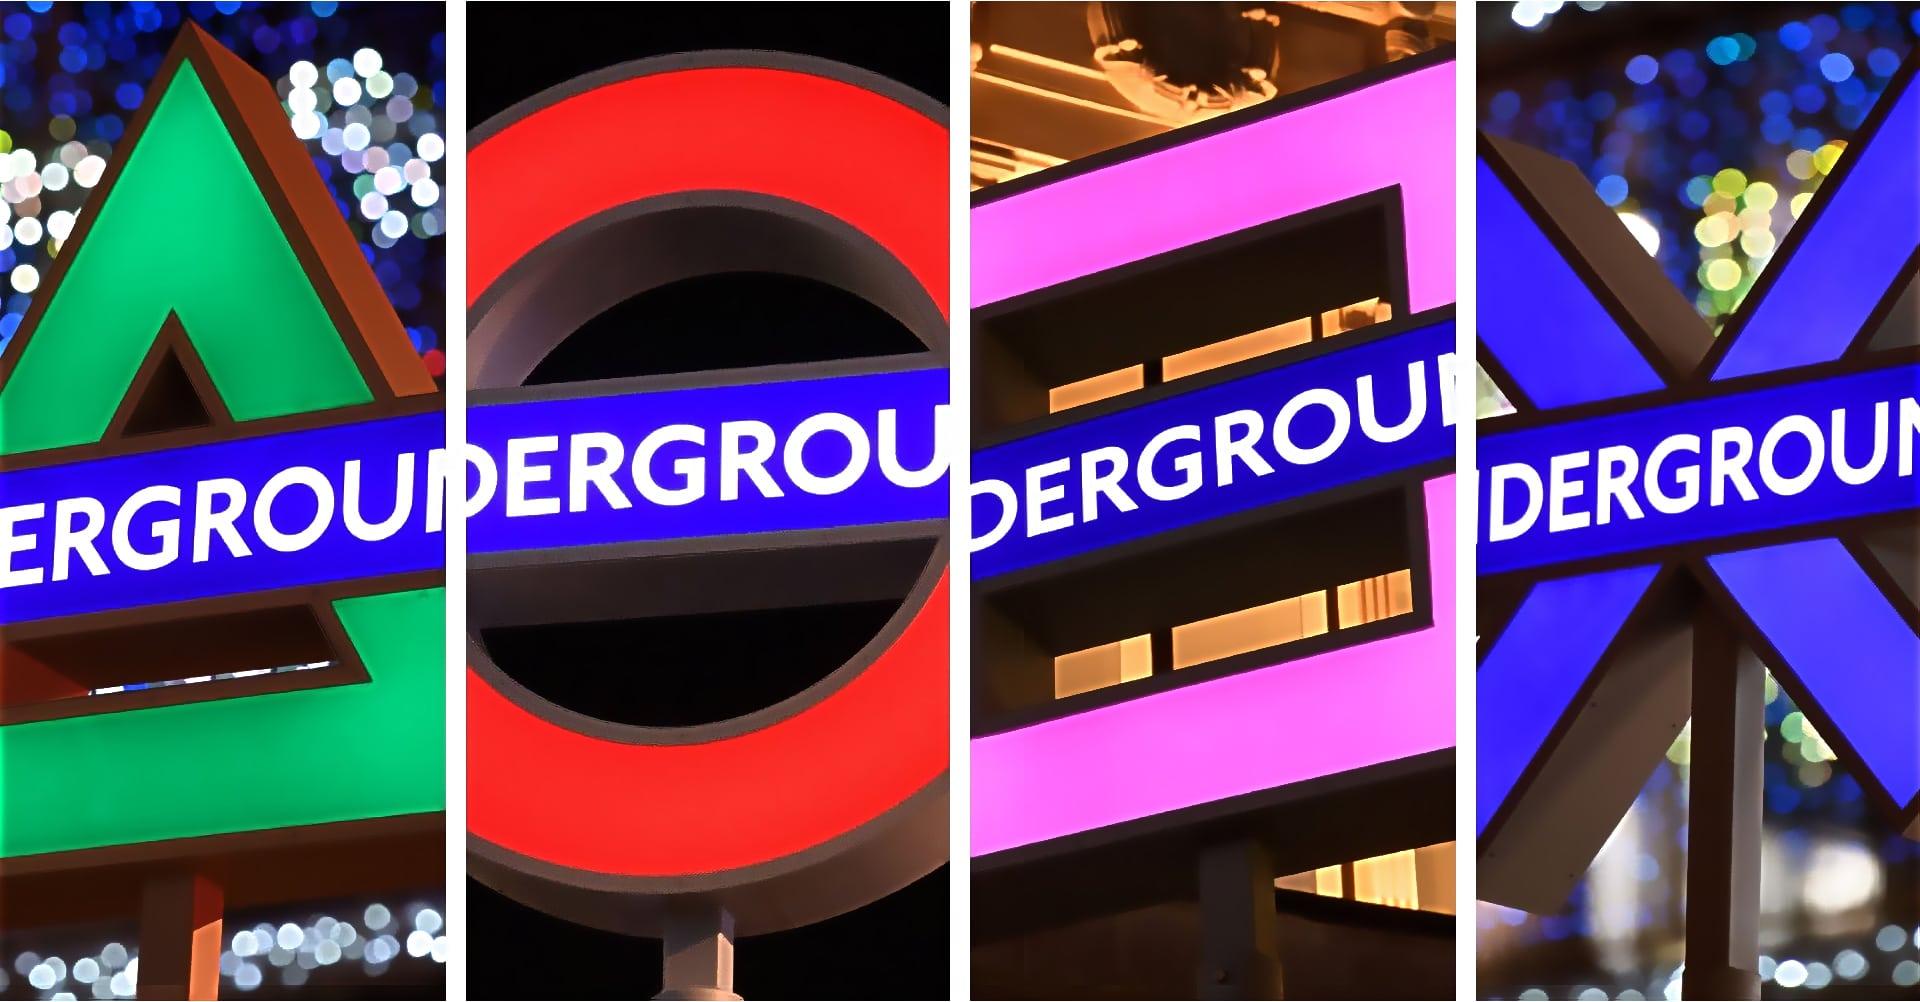 playstation London Underground